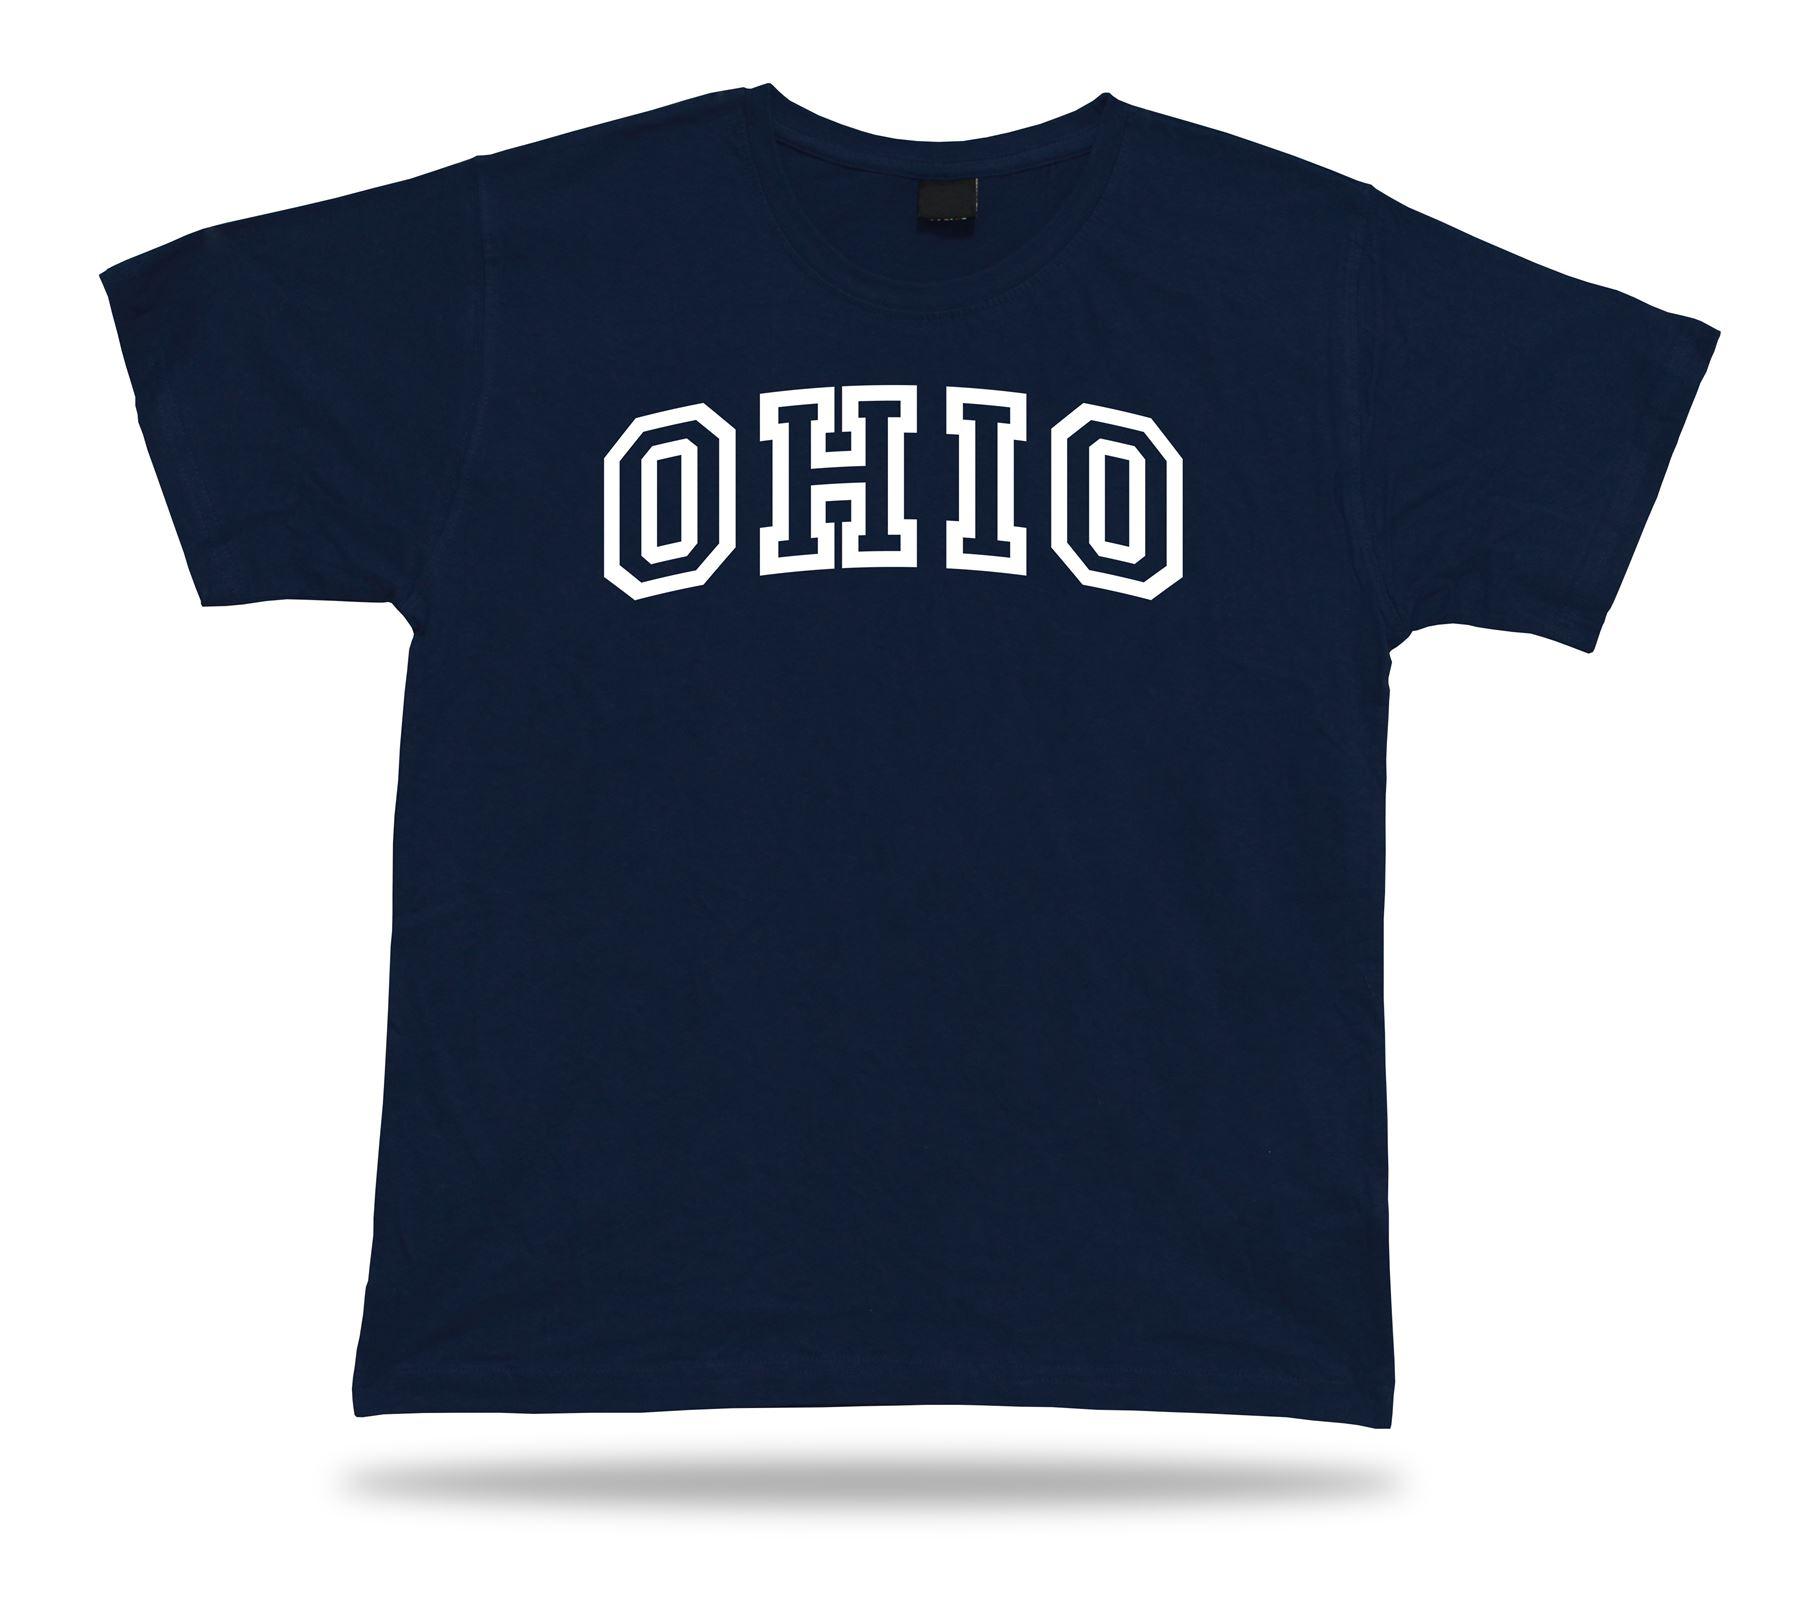 Ohio Buckeye State OH T-Shirt Fan TEE unisex Top Fashion Modern Apparel style